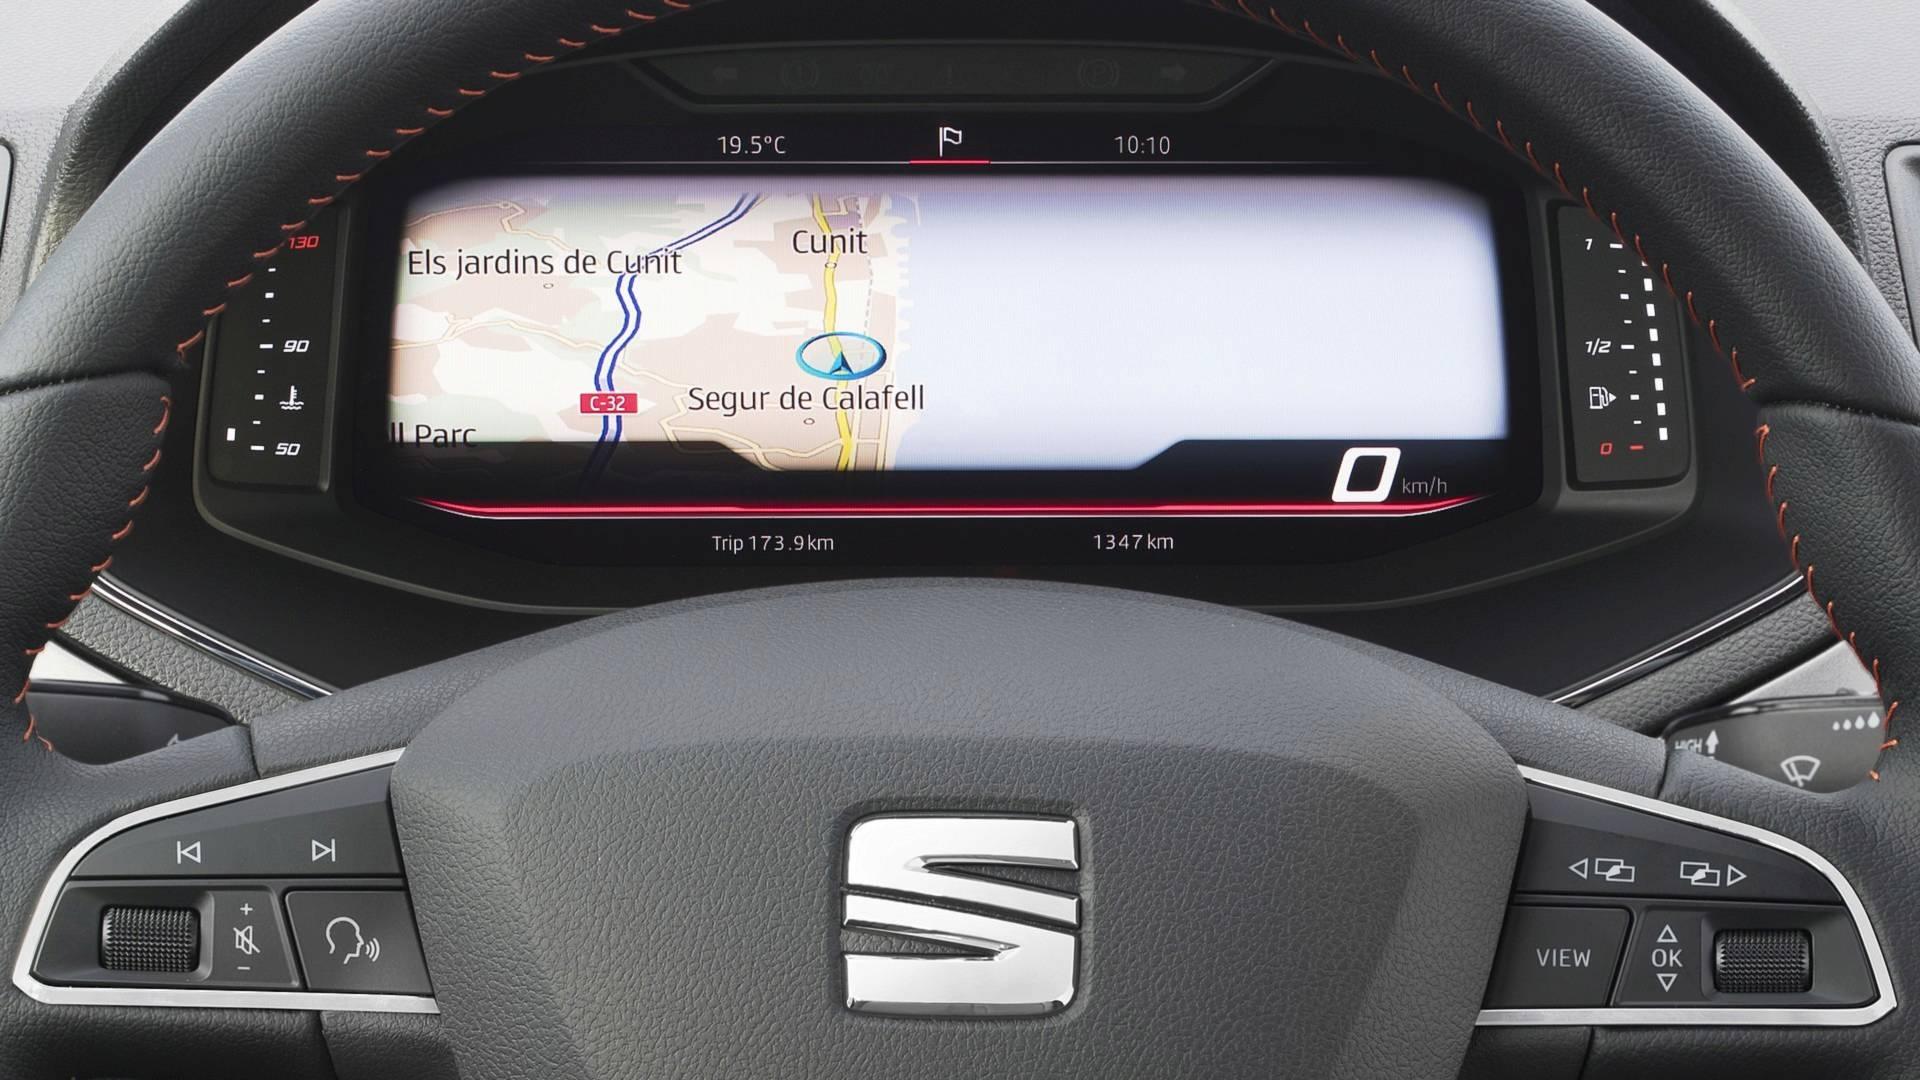 SEAT_Ibiza_and_Arona_Digital_Cockpit_0005